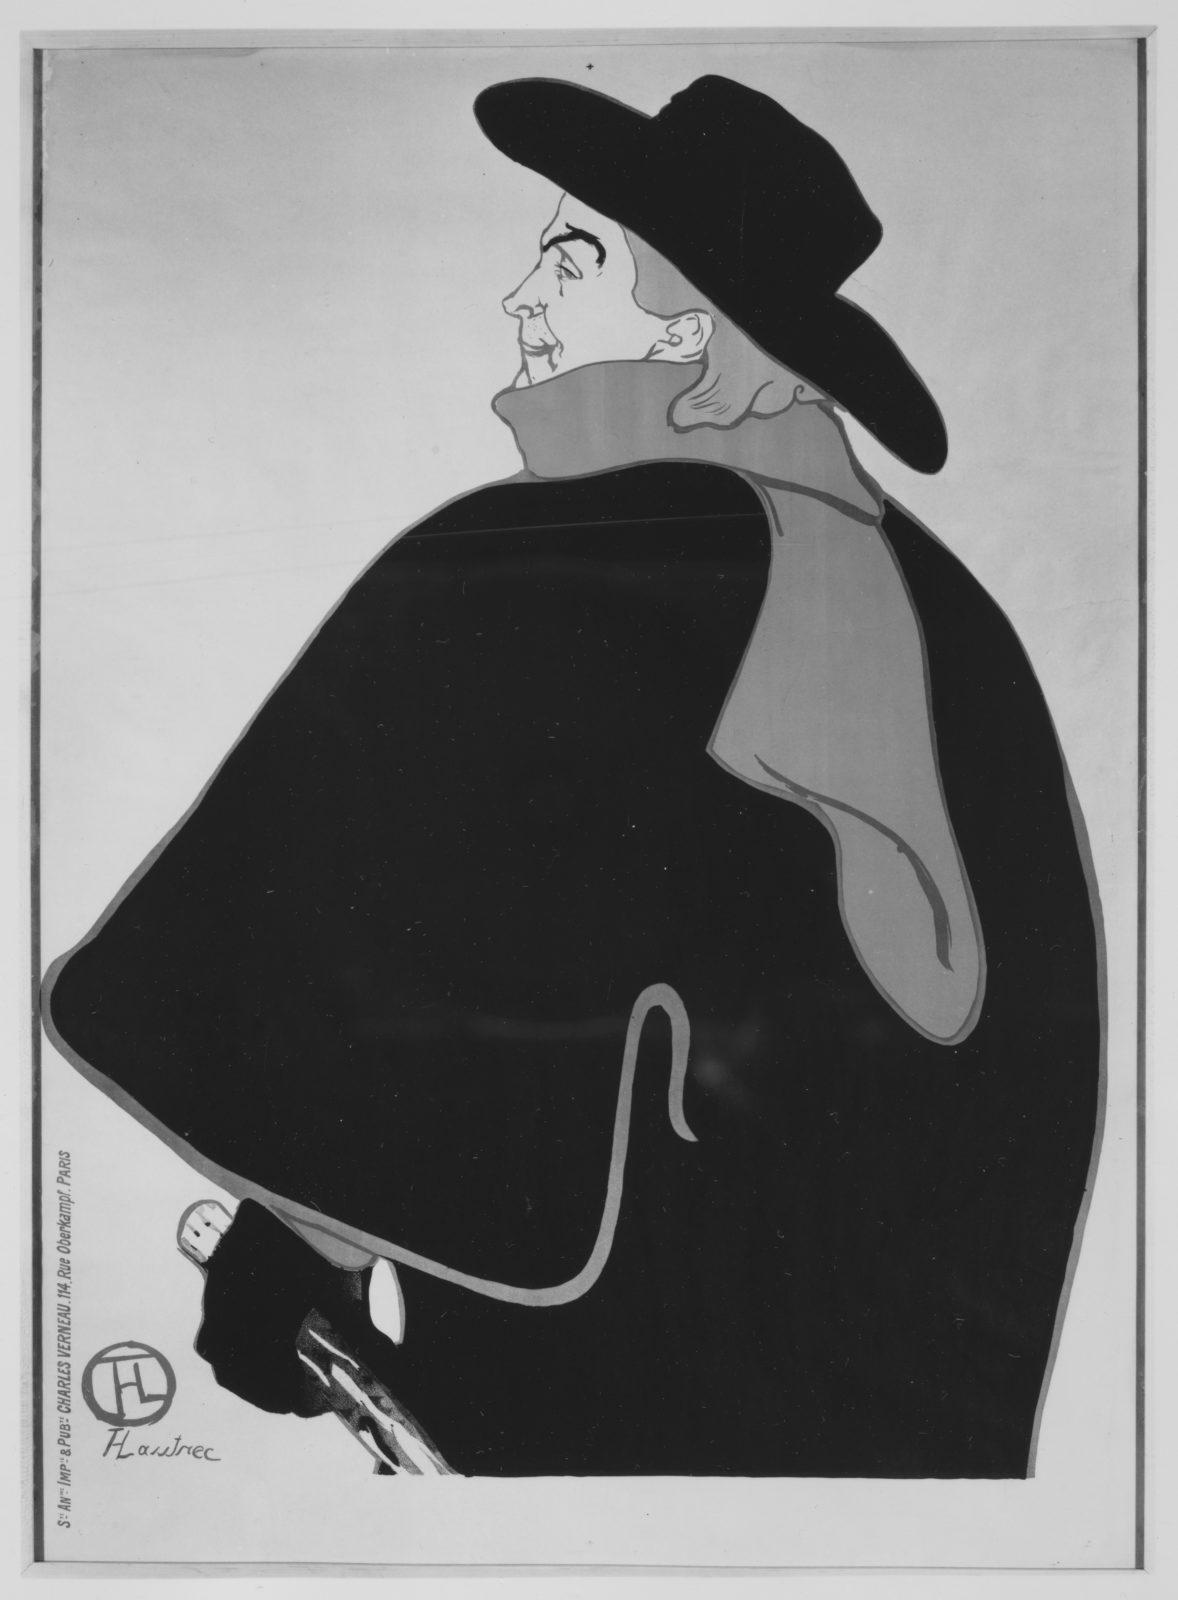 Aristide Bruant, dans son cabaret